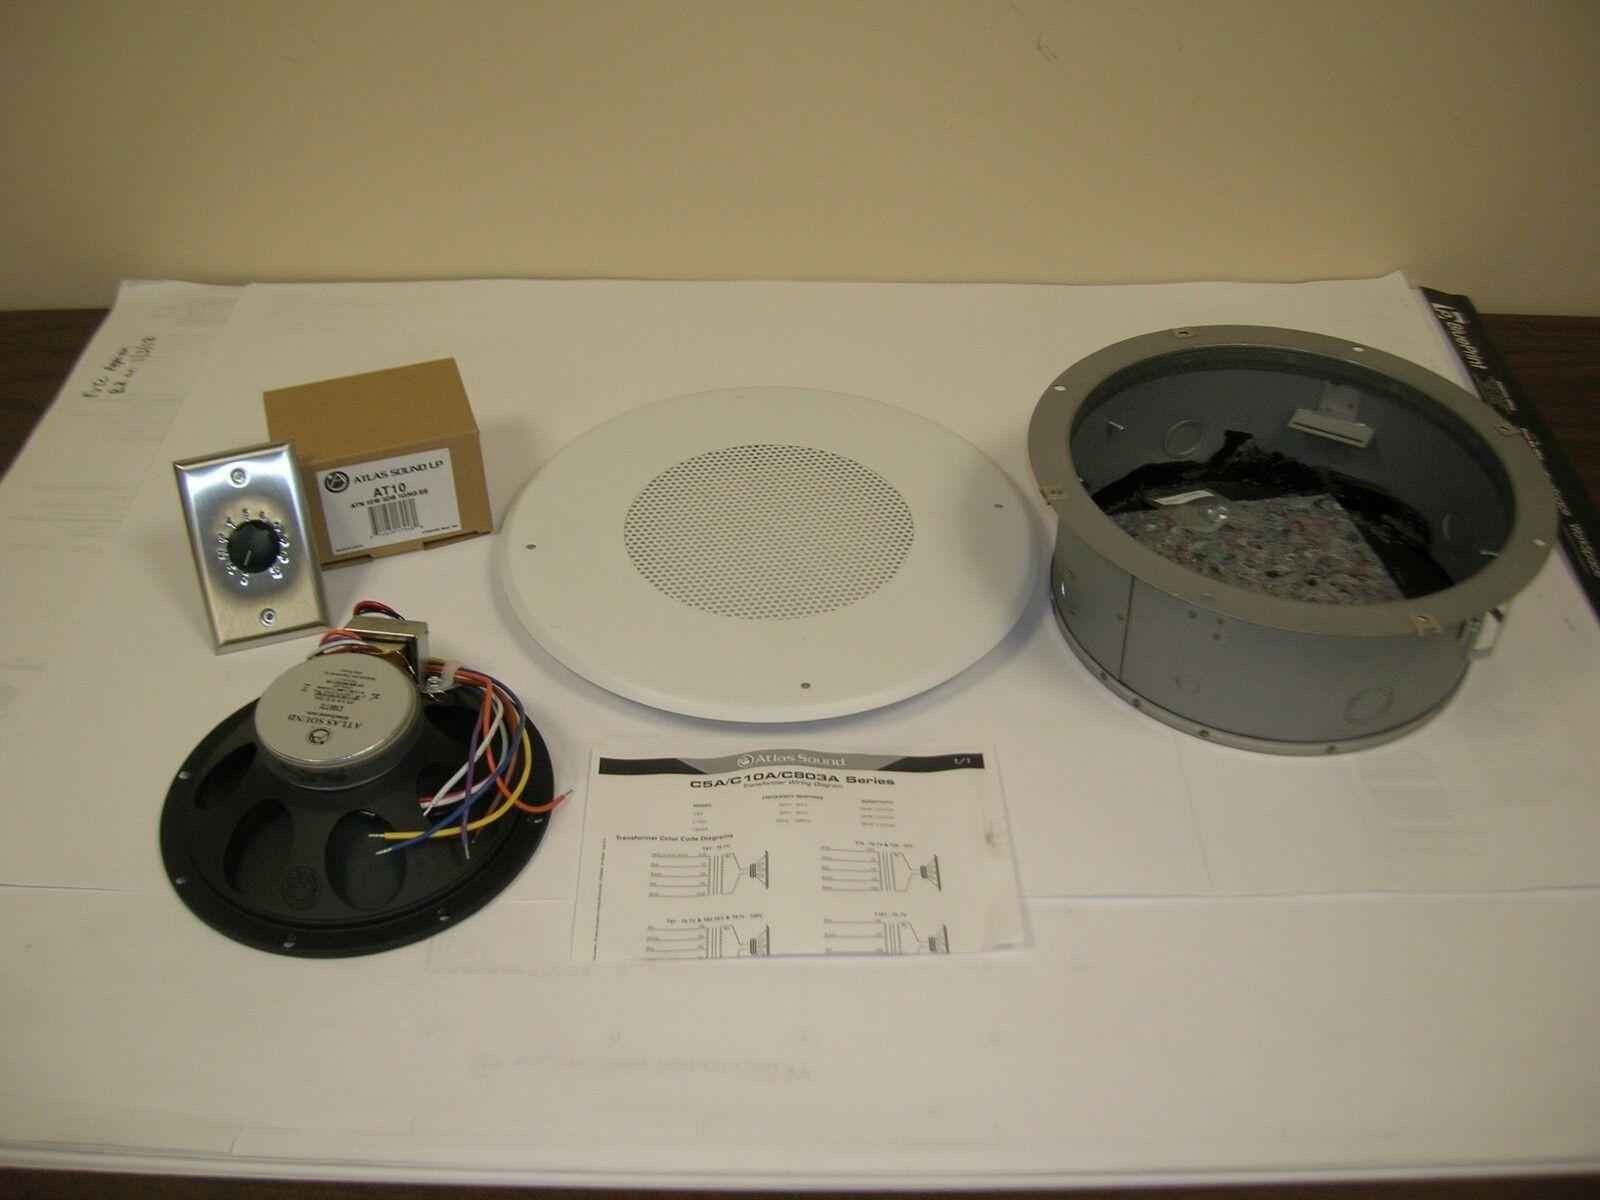 ALL NEW Atlas Sound Baffles Volume Controls Grills Speakers  700.00 Total